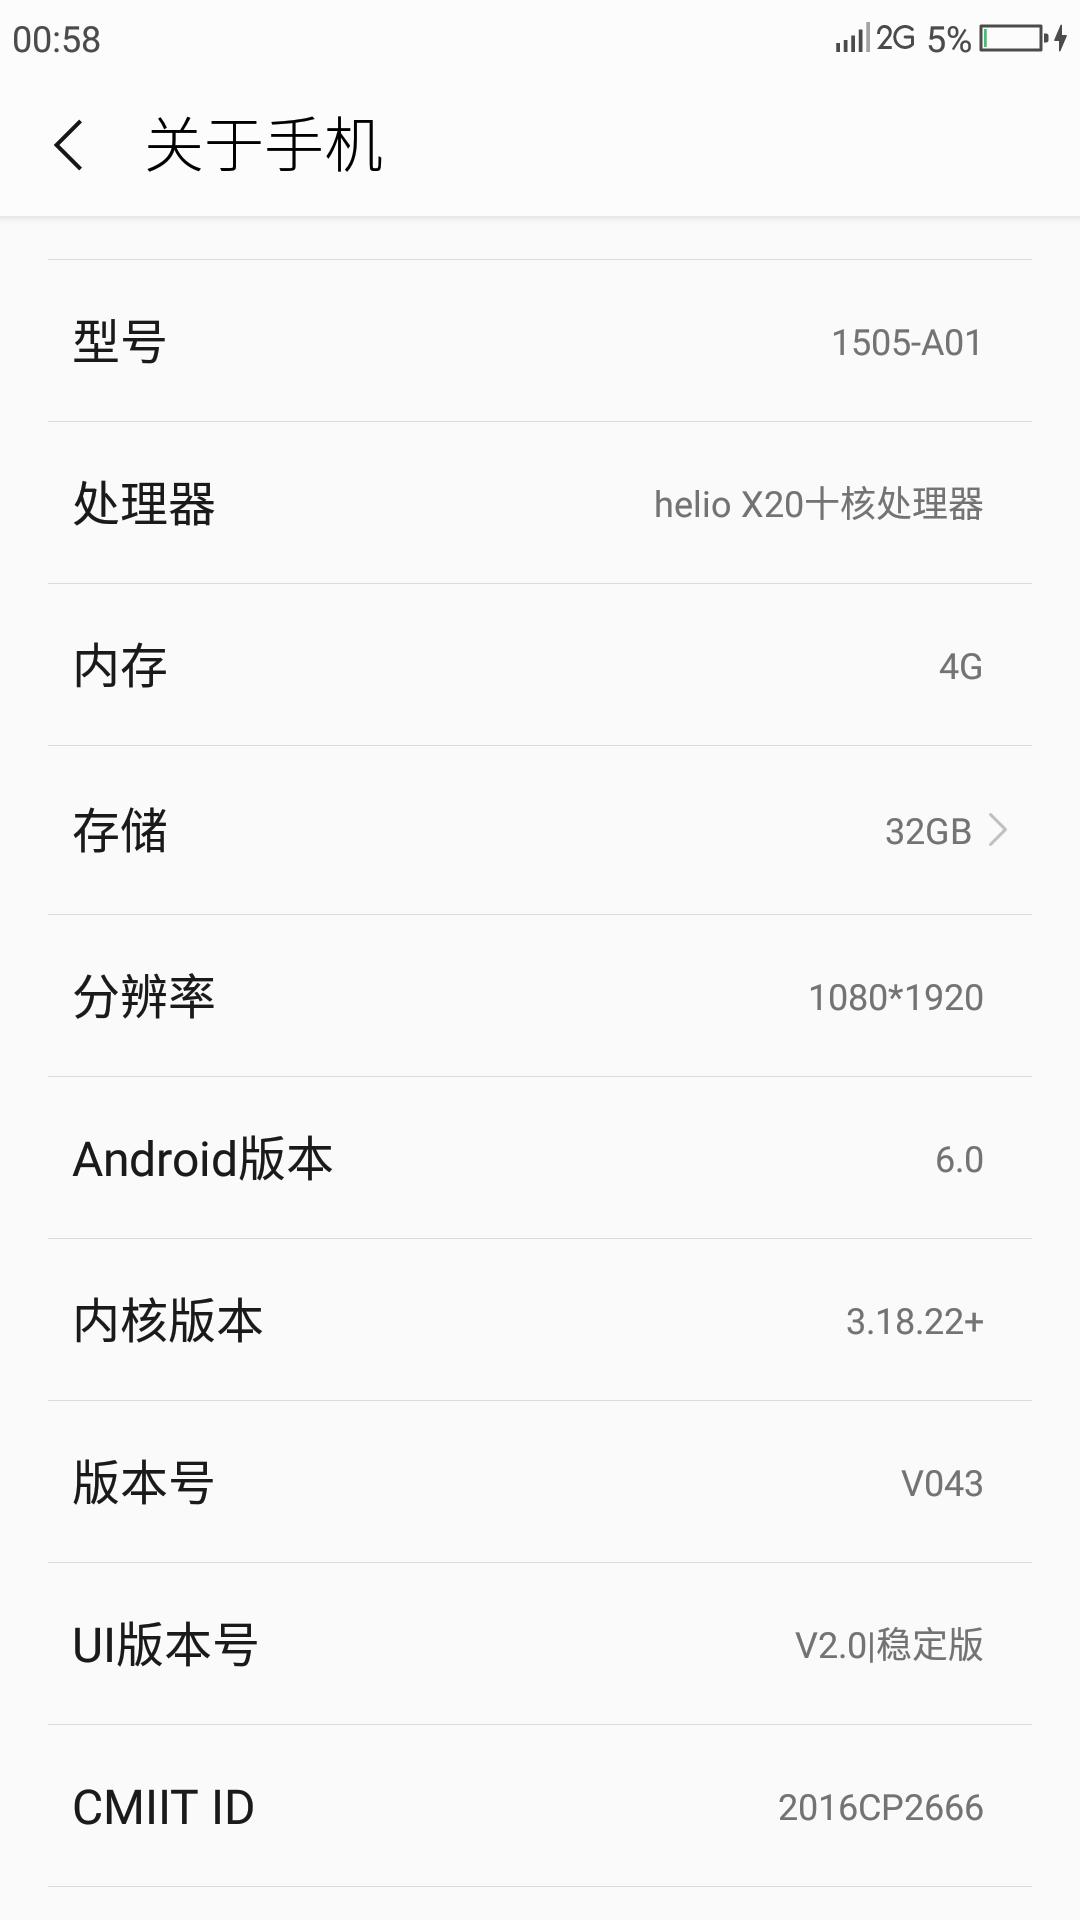 Screenshot_2016-09-29-00-58-50.png